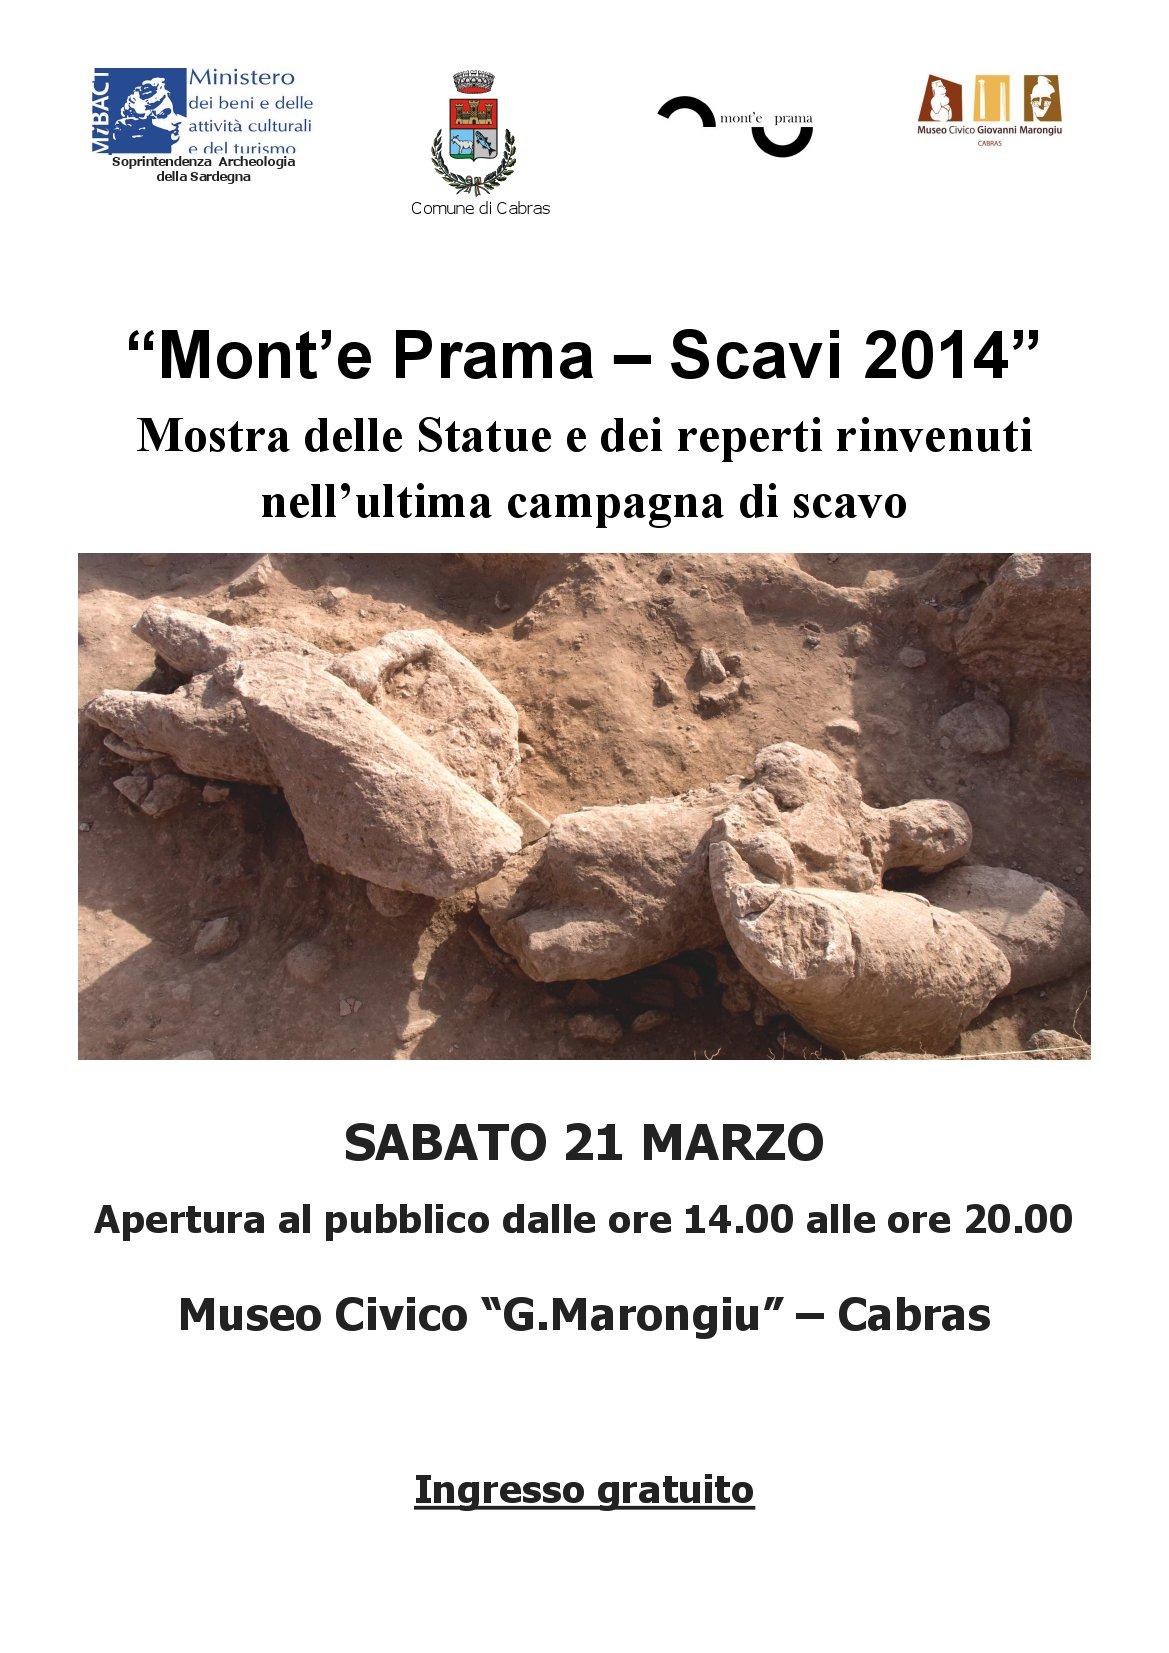 Scavi-Mont'e-prama-2014